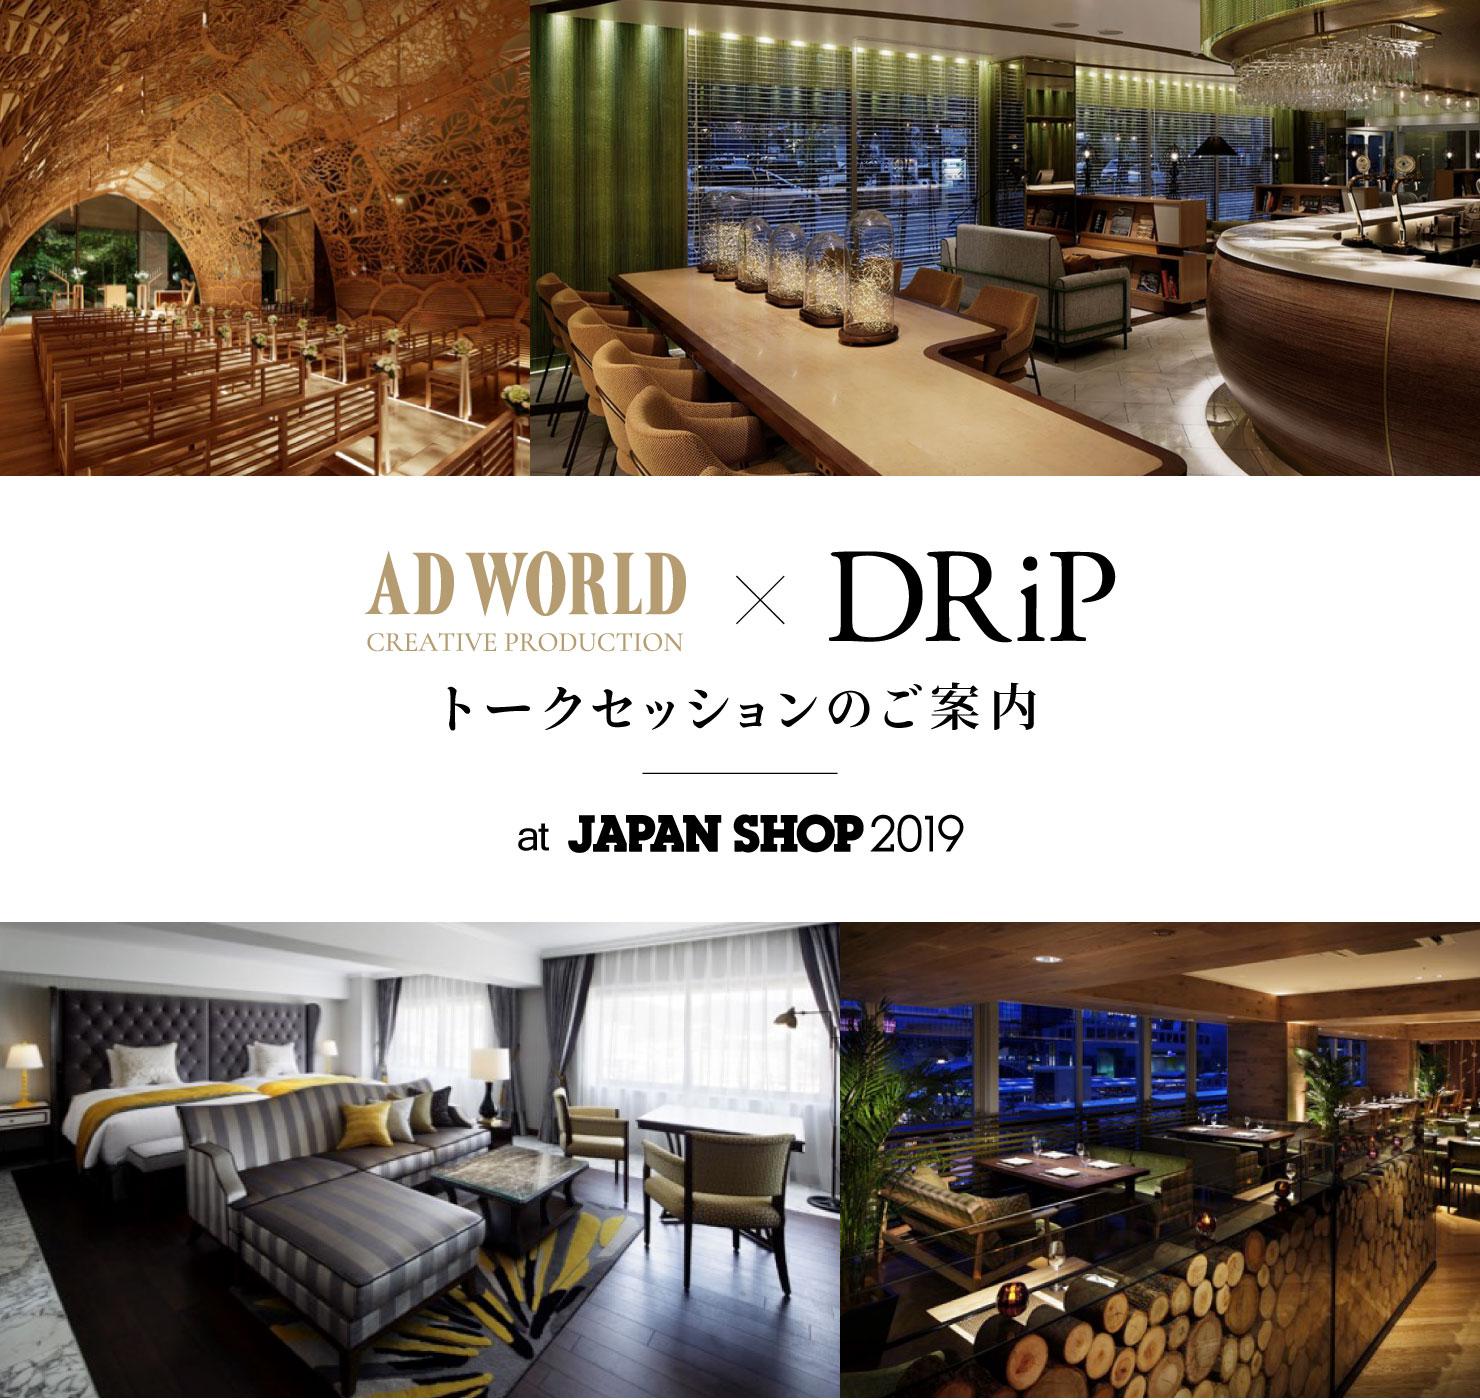 AD WORLD × DRip トークセッションのご案内 at JAPAN SHOP 2019